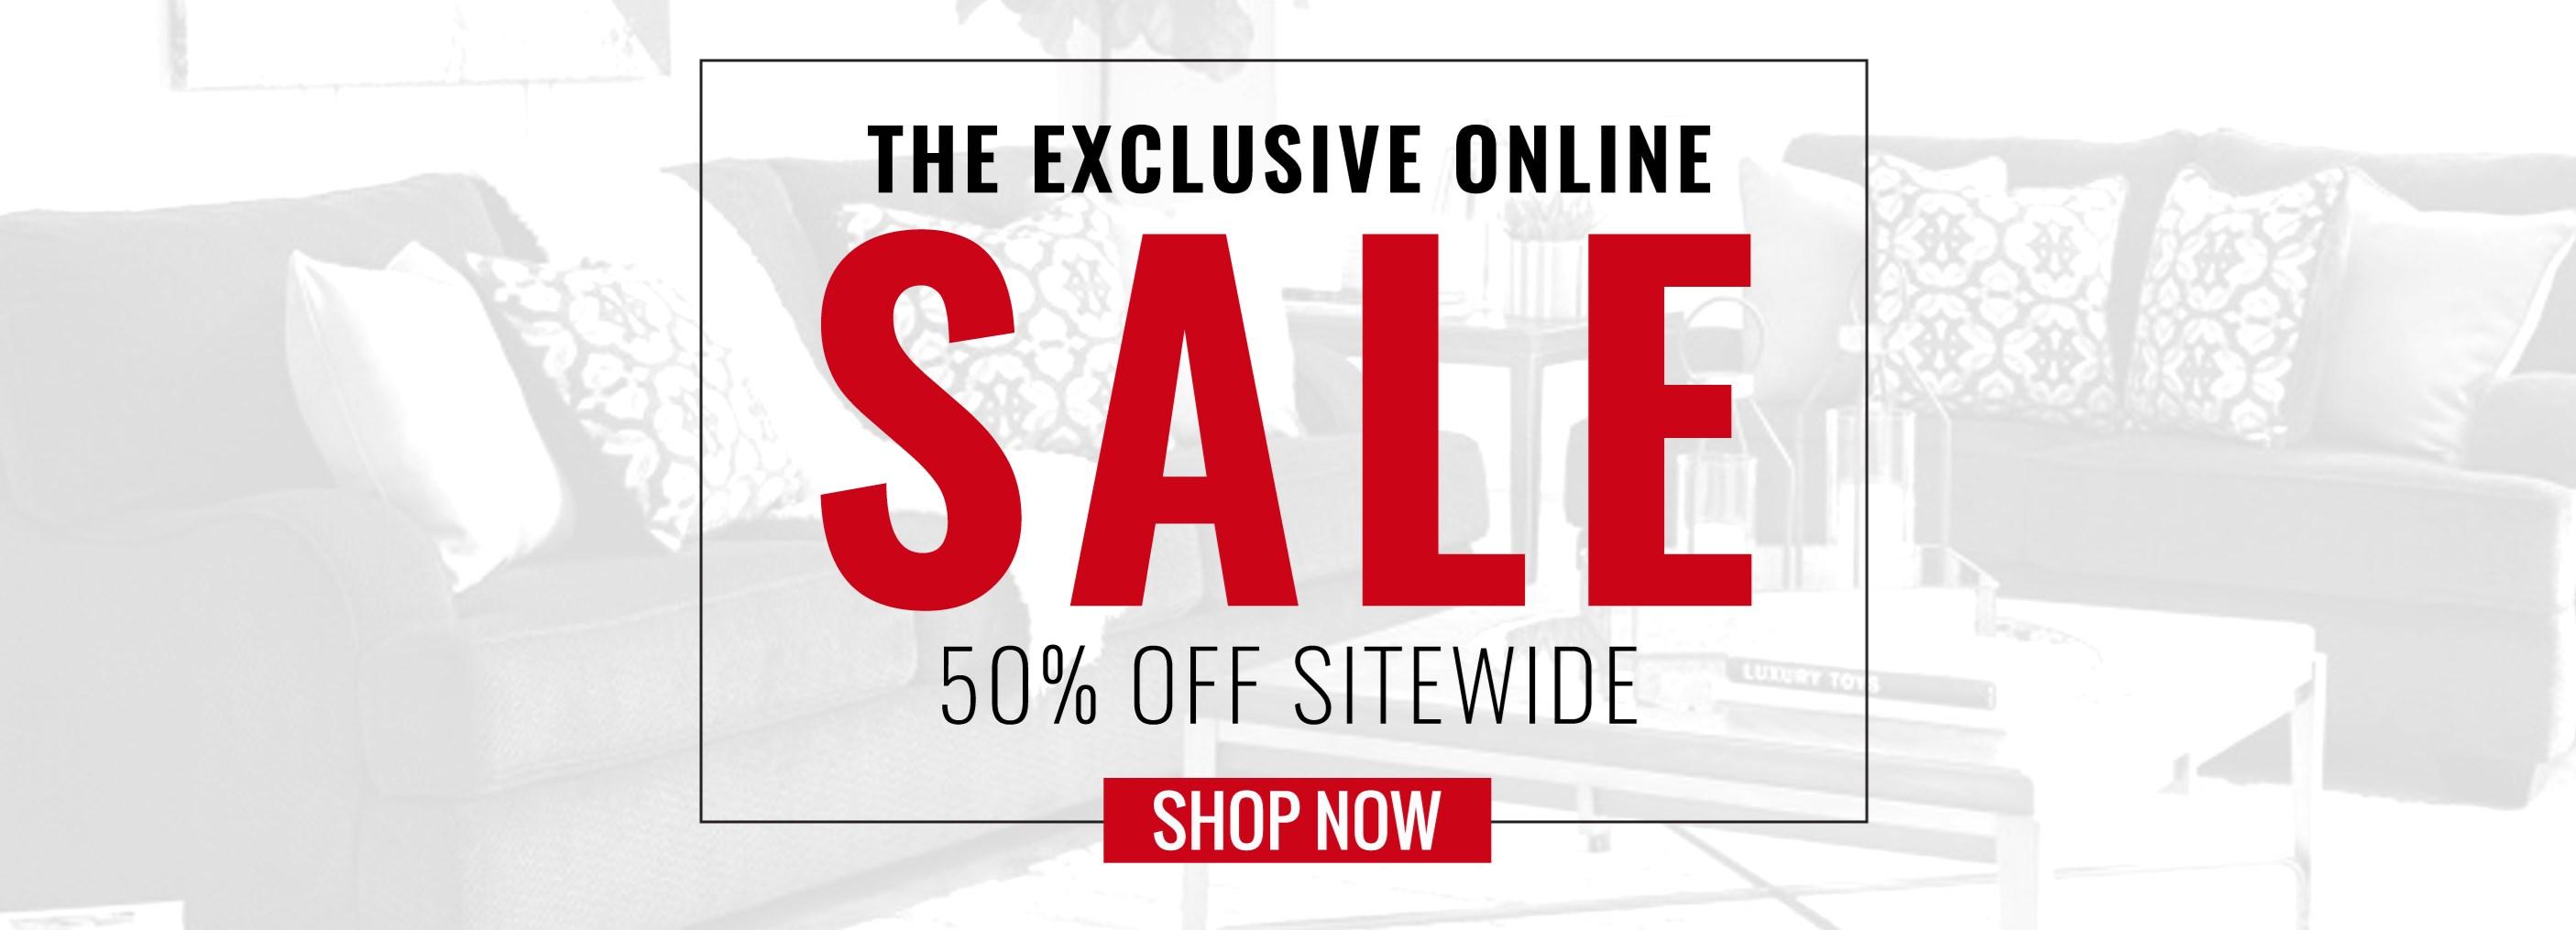 best woodbridge furniture co. Online Only Sale Outdoor Furniture Chime Mattress  Store New Jersey NJ Staten Island